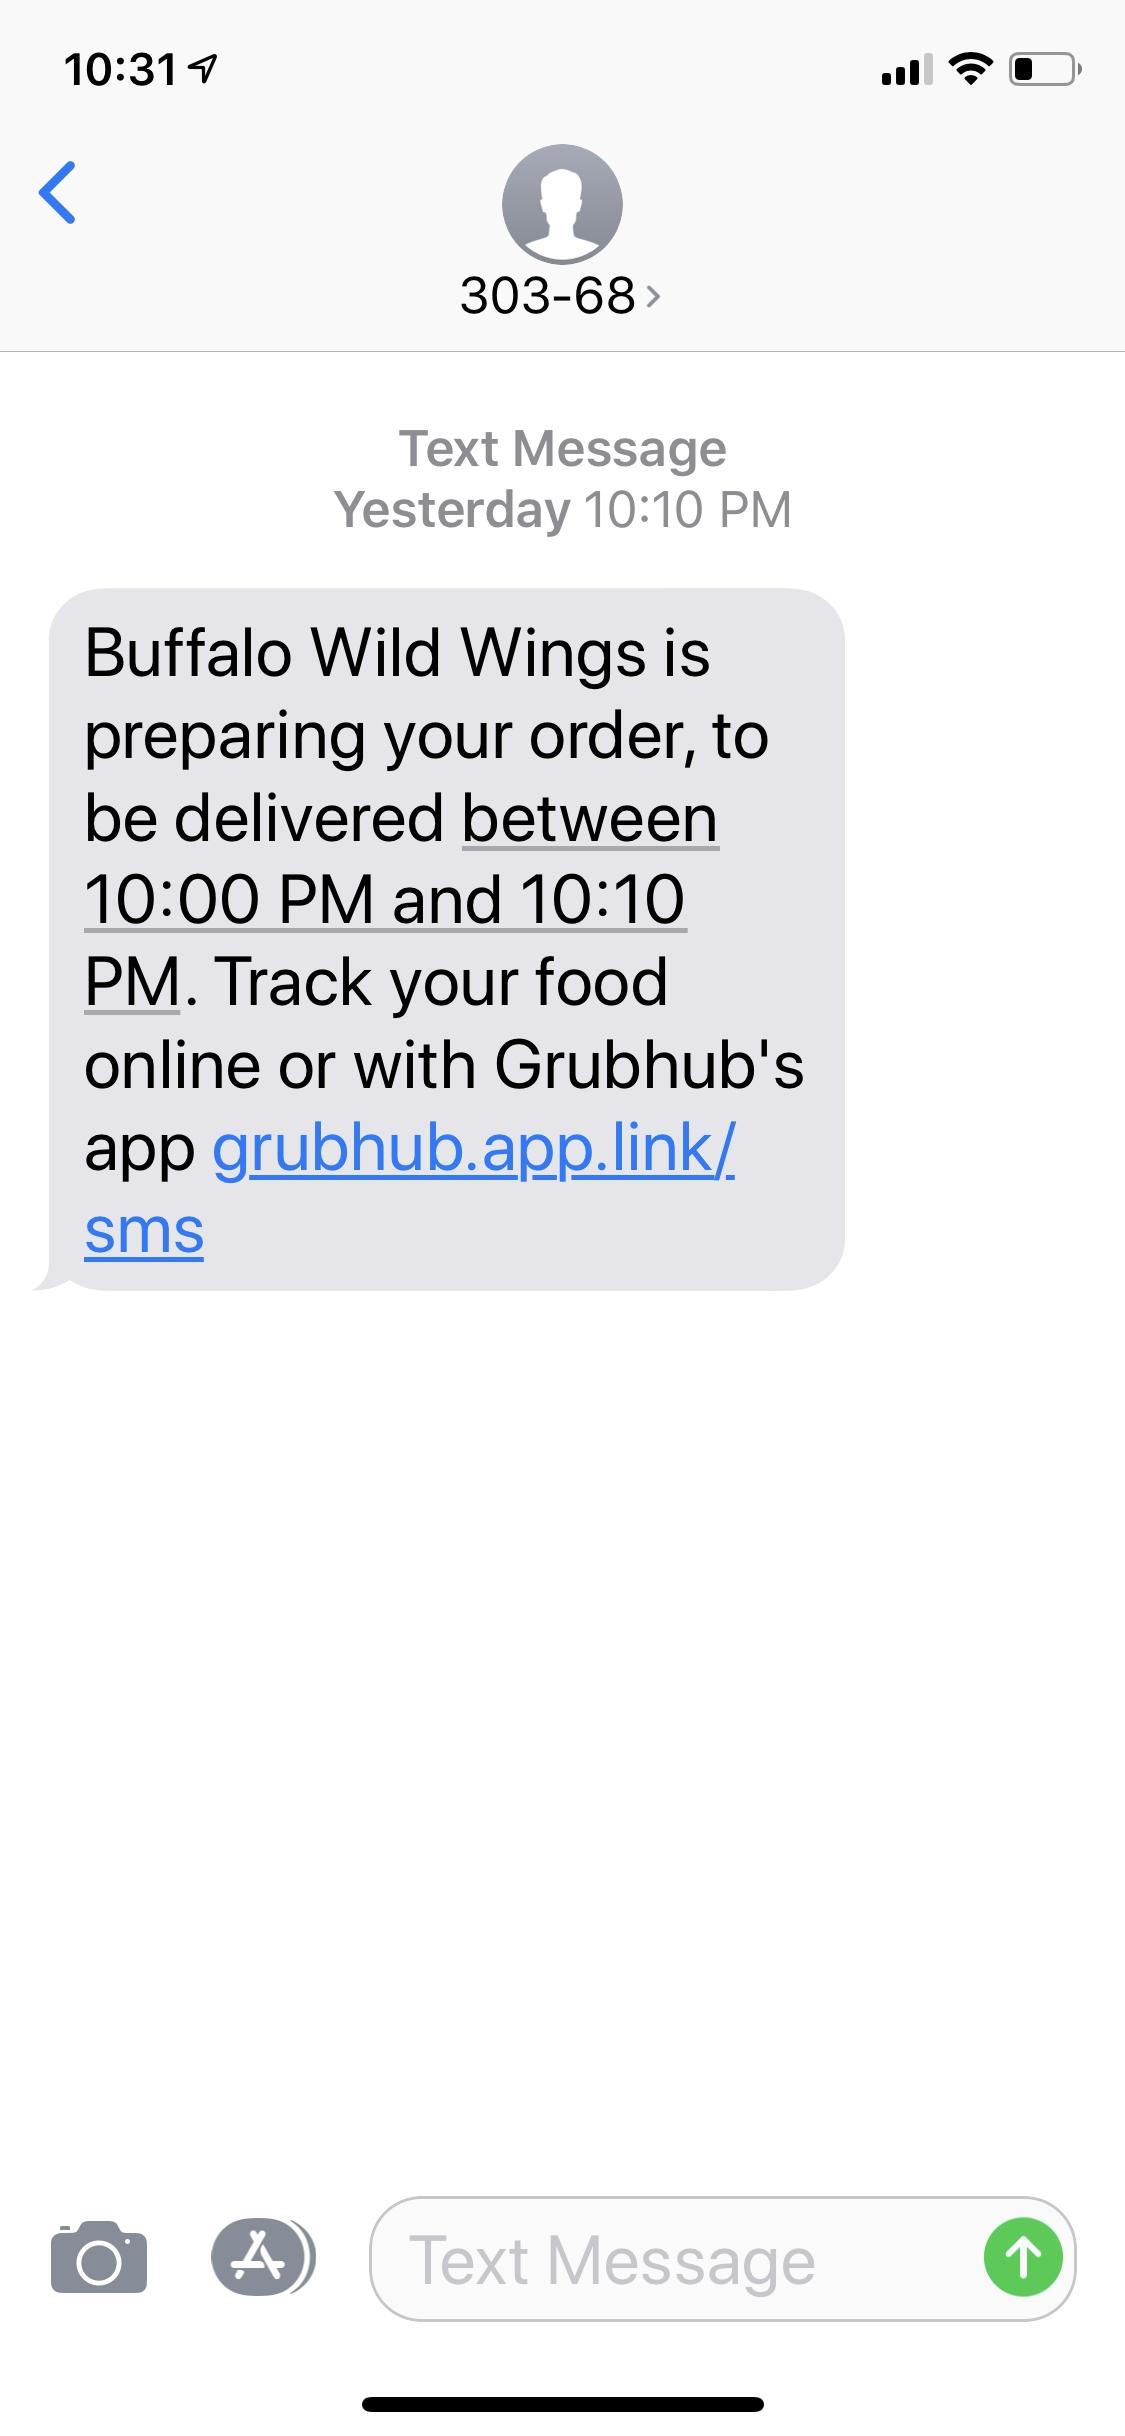 grubhub driver app not trusted